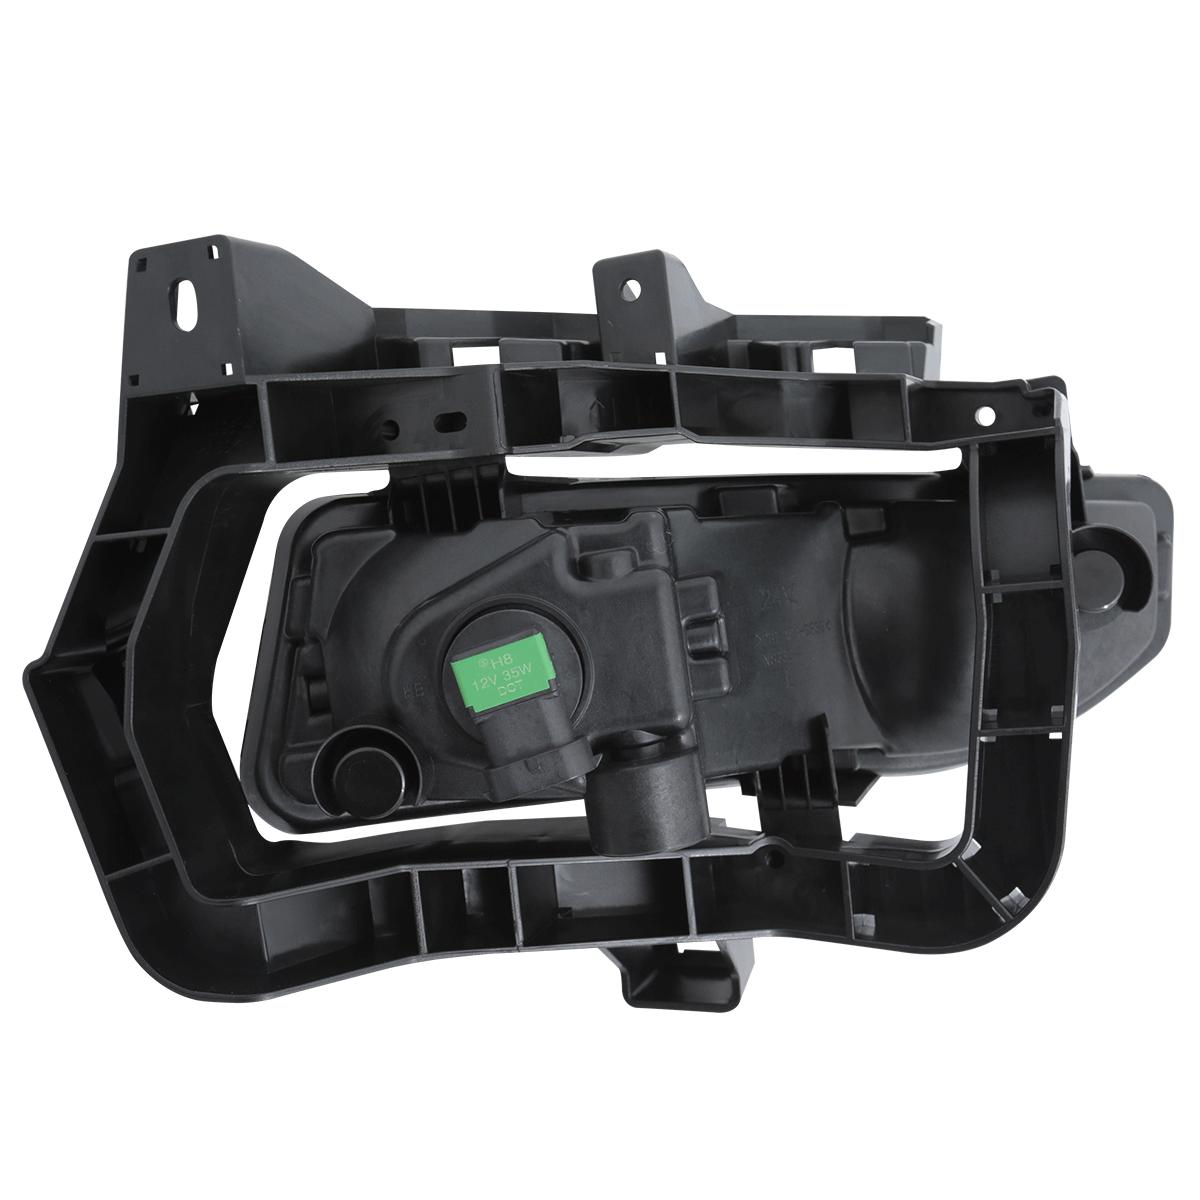 Fit 2017 2018 Nissan Versa Note Bumper Fog Lights Switch Bracket 2015 Wiring Harness